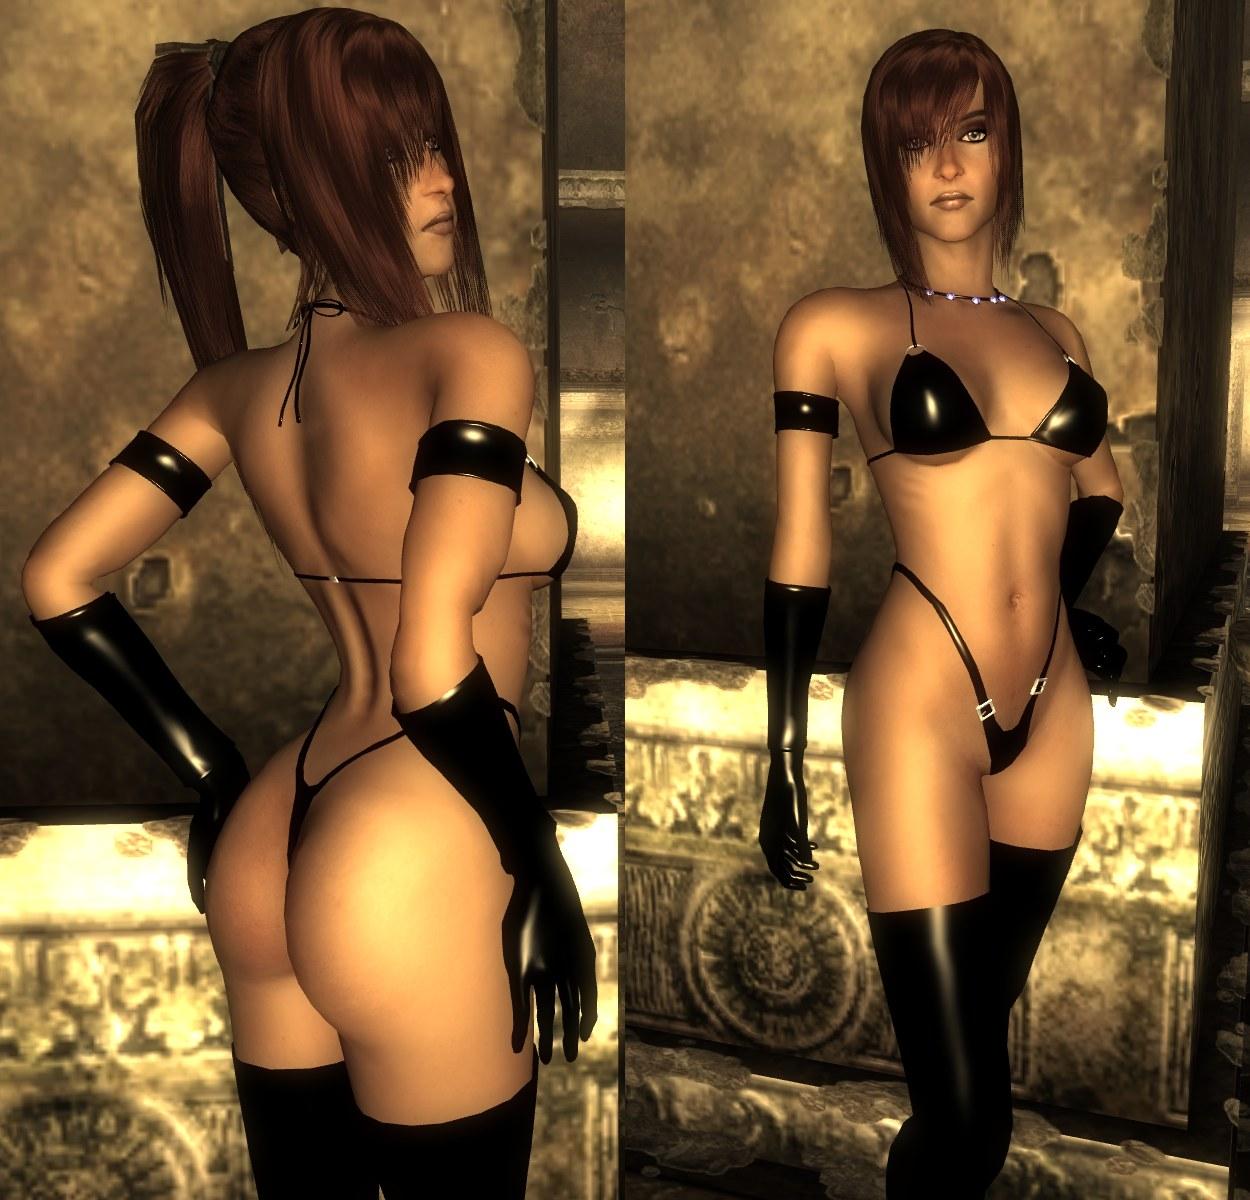 Fallout 3 fetish lingerie mod pornos whores